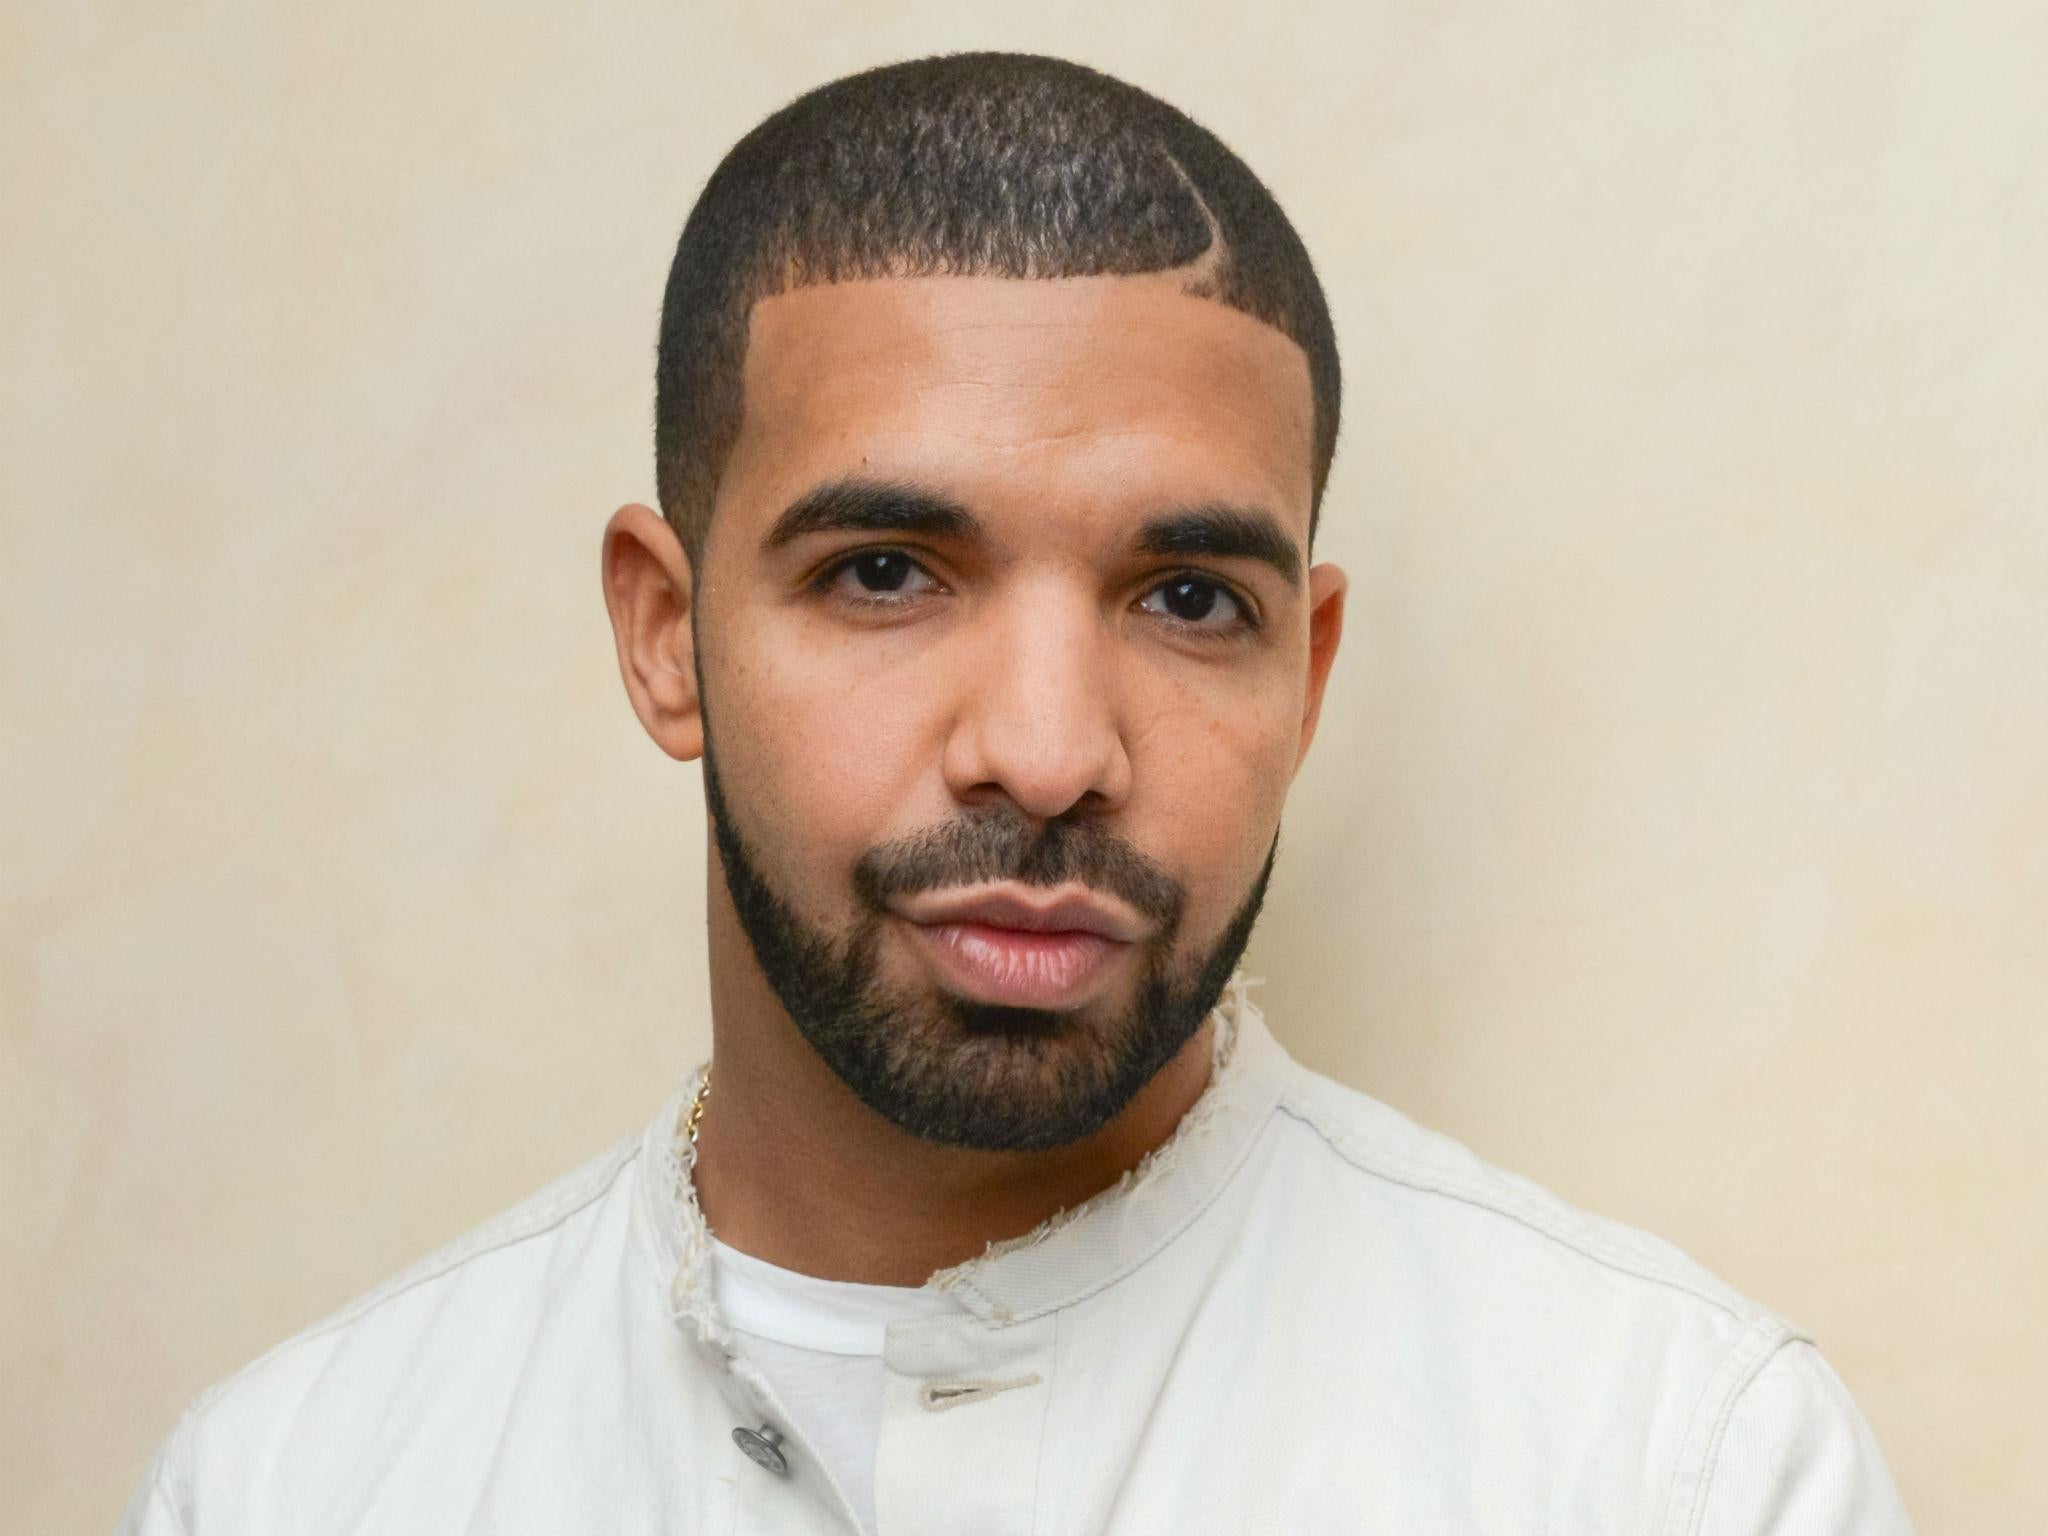 Drake lyrics on Scorpion track 'Emotionless' confirms he has